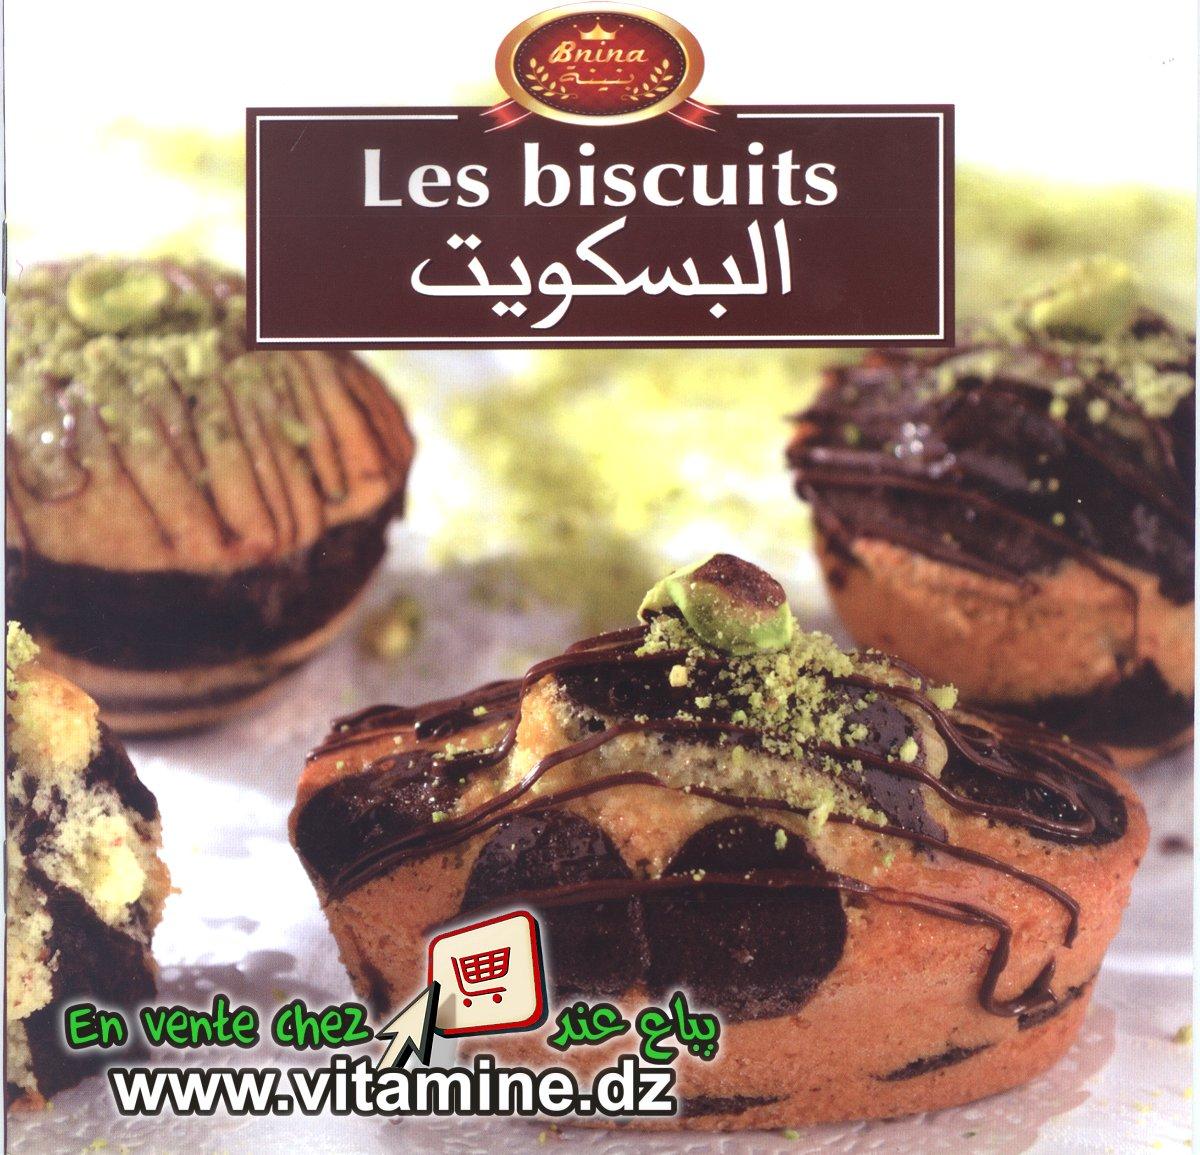 Bnina - Les biscuits